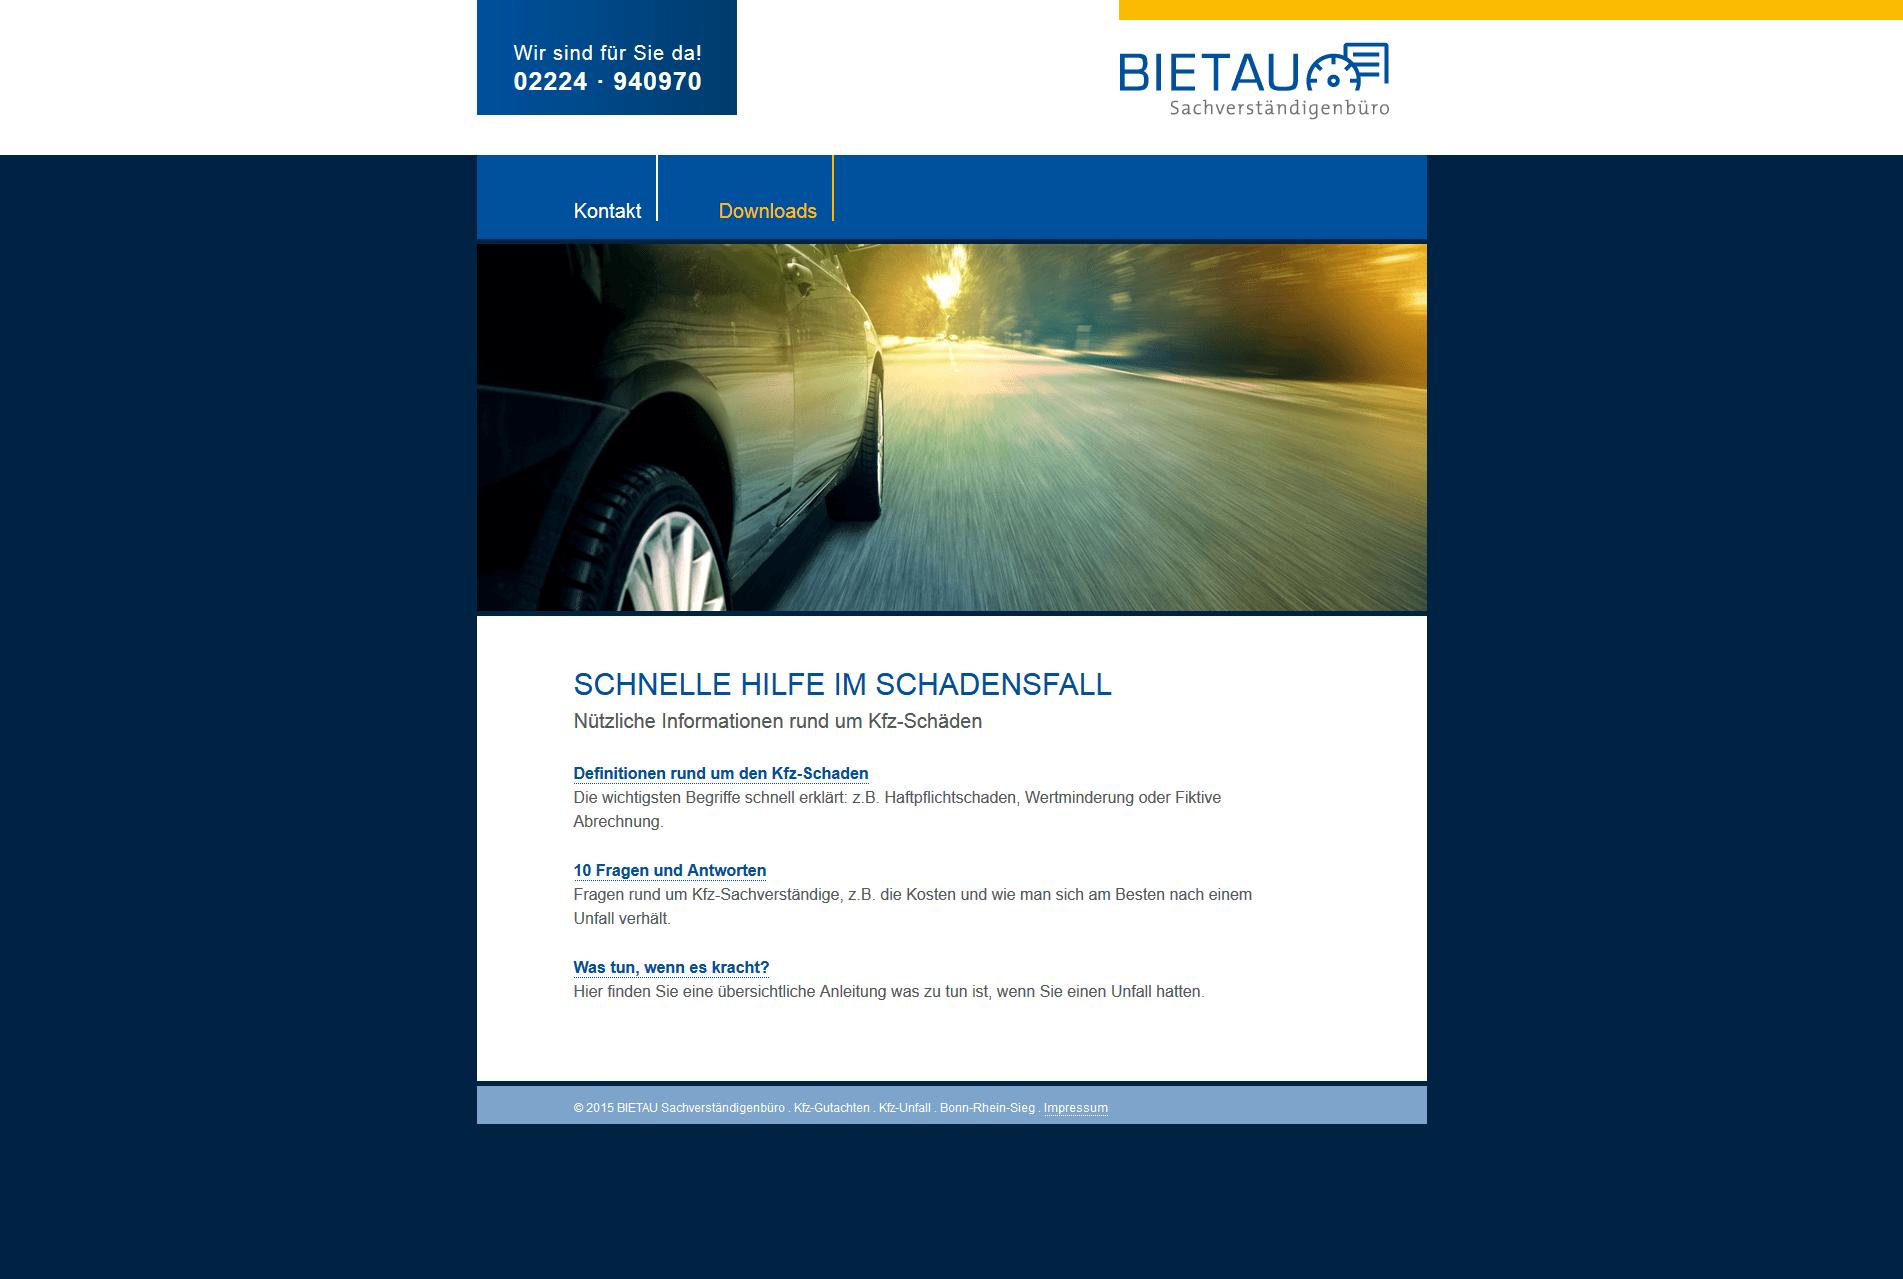 107-bietau_3